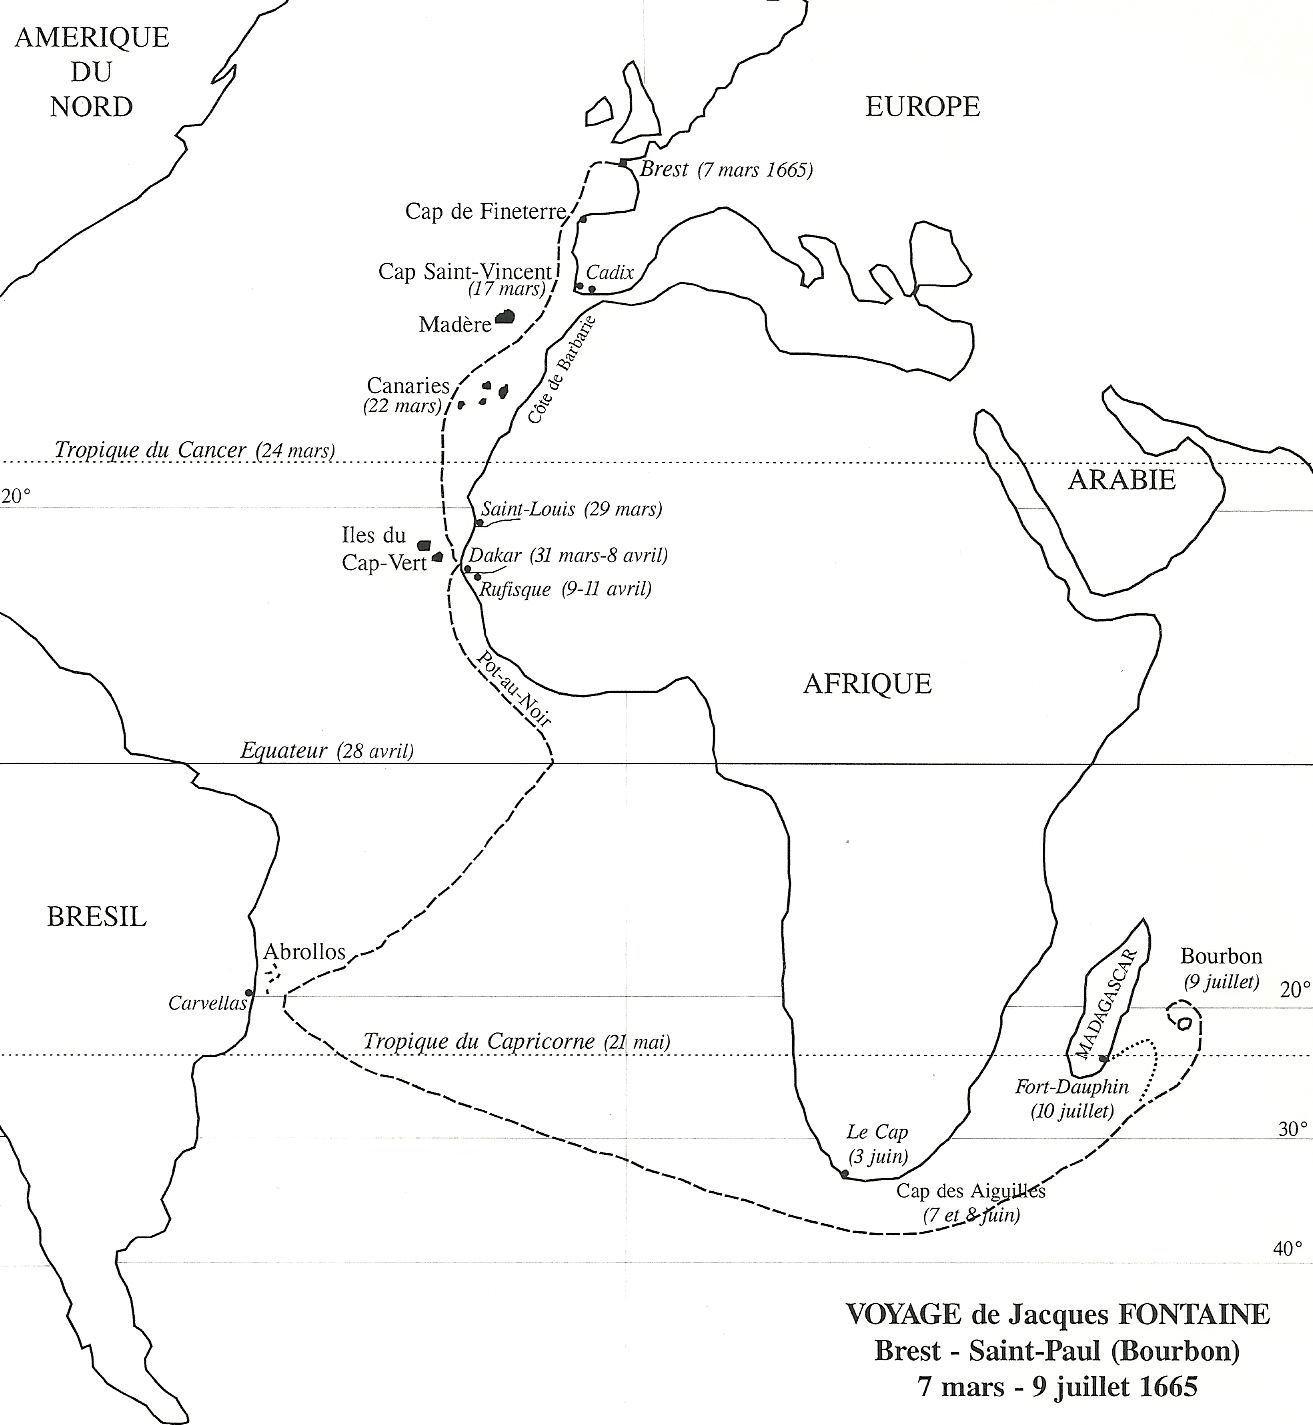 voyagejacquesfontine.jpg